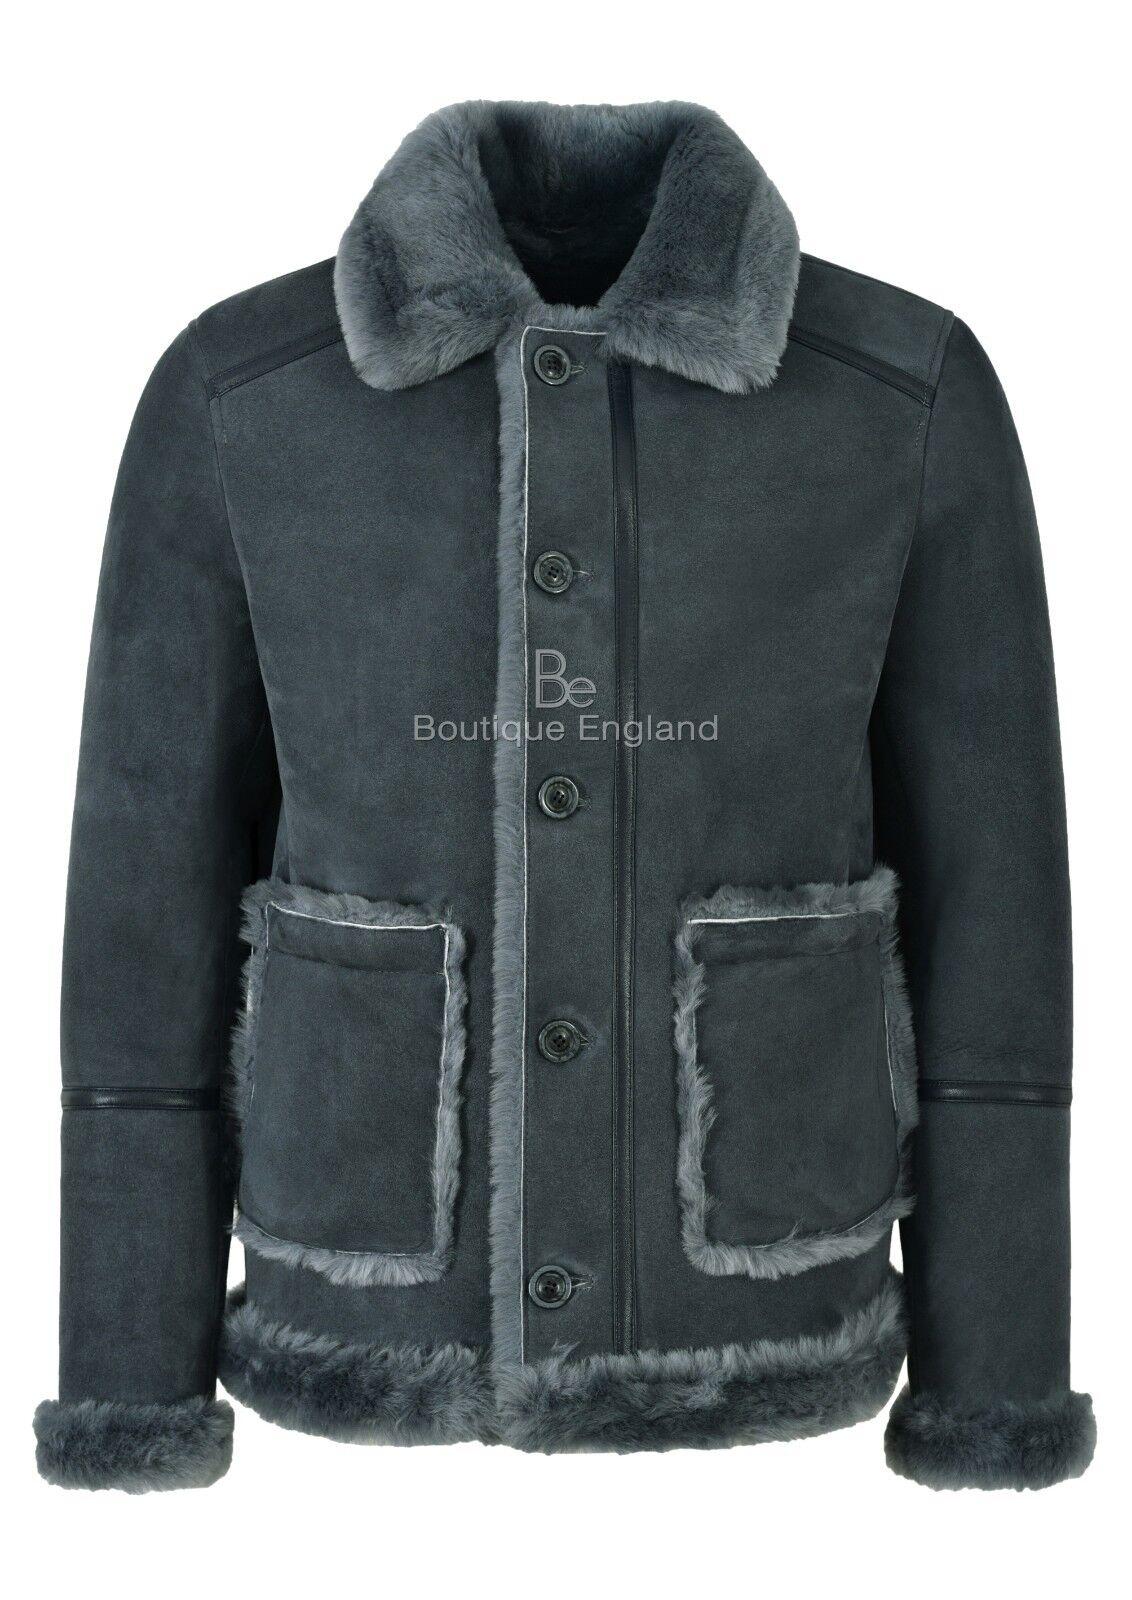 Men's Genuine Vintage Shearling Sheepskin Jacket grau  grau Fur WW2 Style F-44